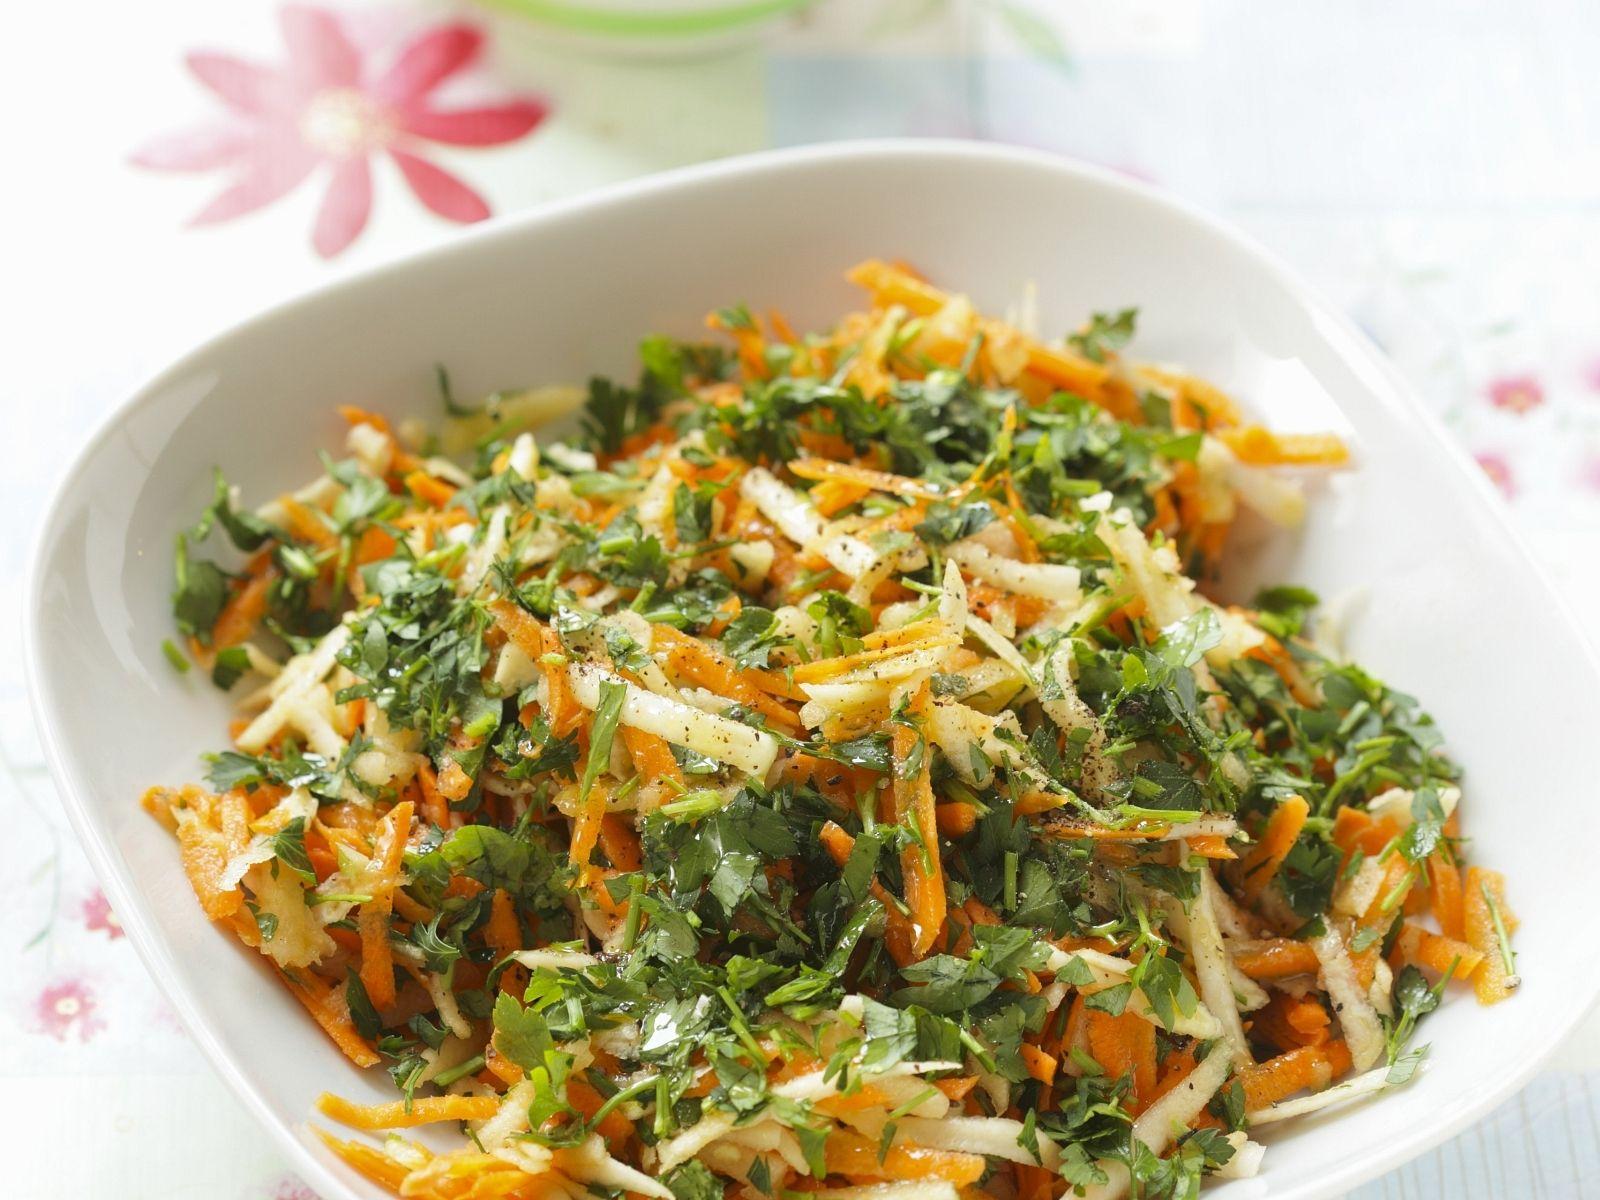 Karotten-Sellerie-Salat mit Petersilie Rezept | EAT SMARTER